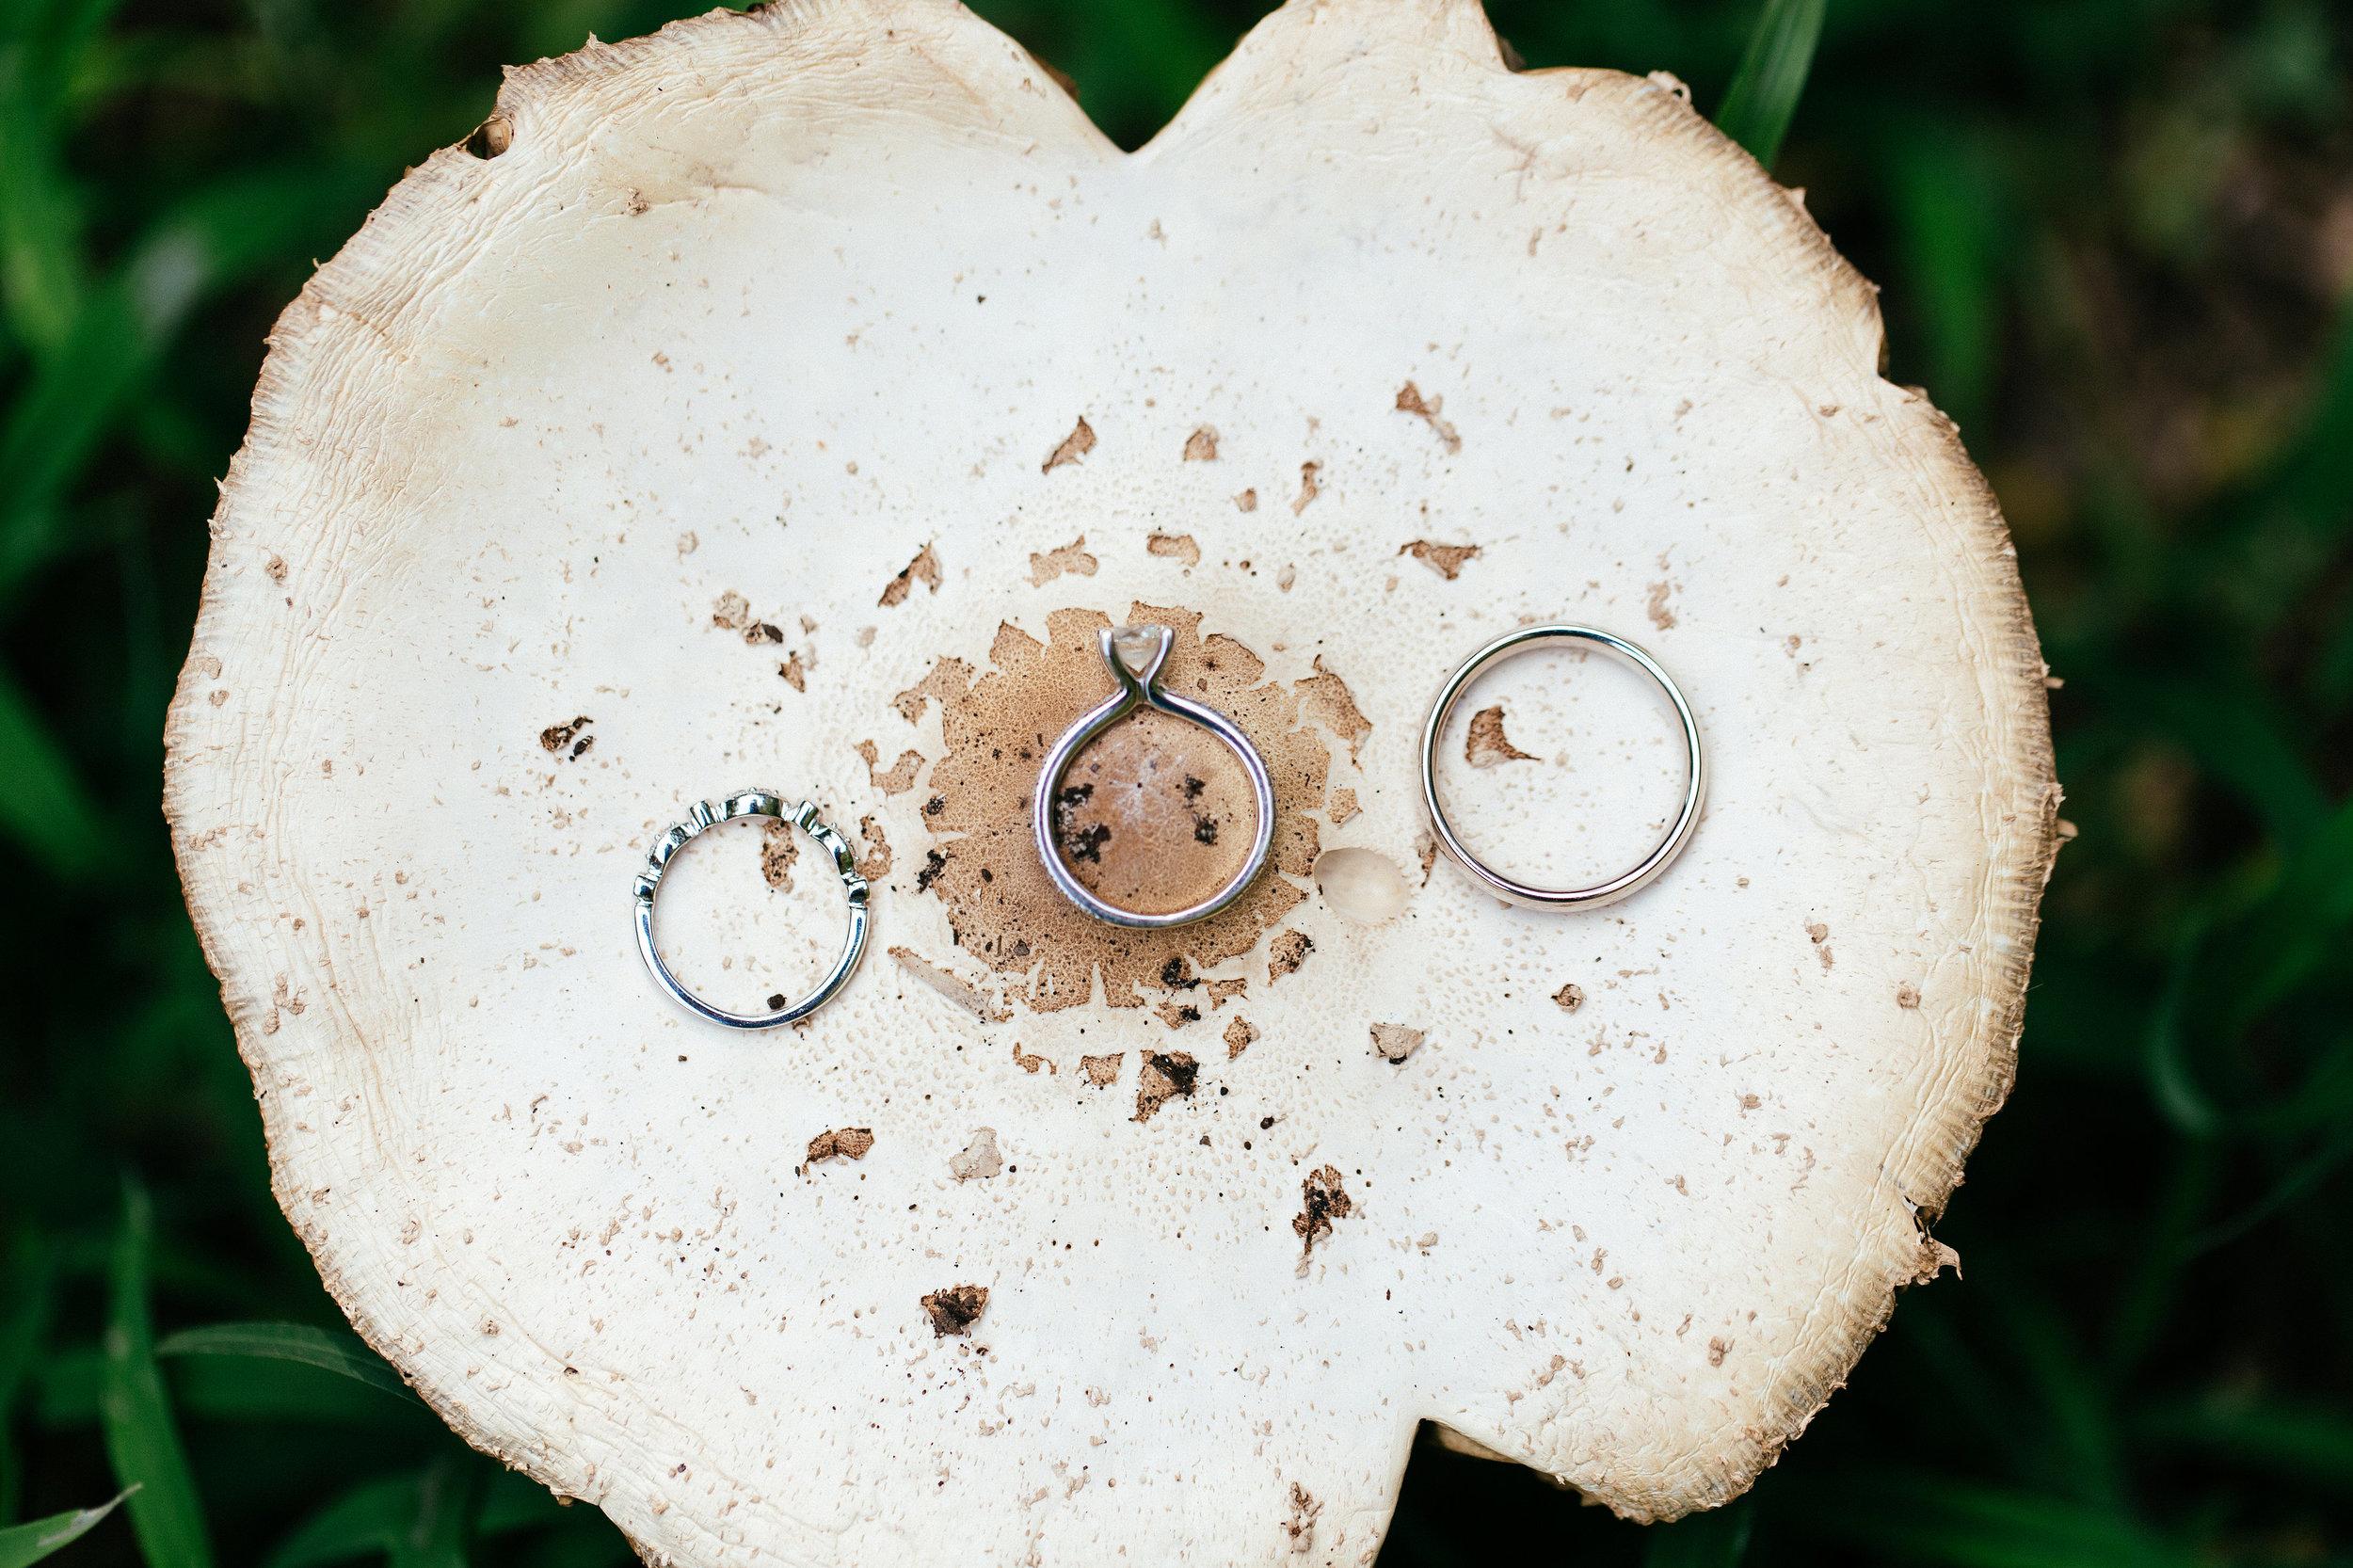 christina-karst-photography-ivory-and-beau-bridal-boutique-sarah-seven-lafayette-boho-bride-boho-bridal-boutique-indie-bridal-boutique-savannah-bridal-boutique-savannah-wedding-dresses-savannah-bridal-gowns-2.jpg